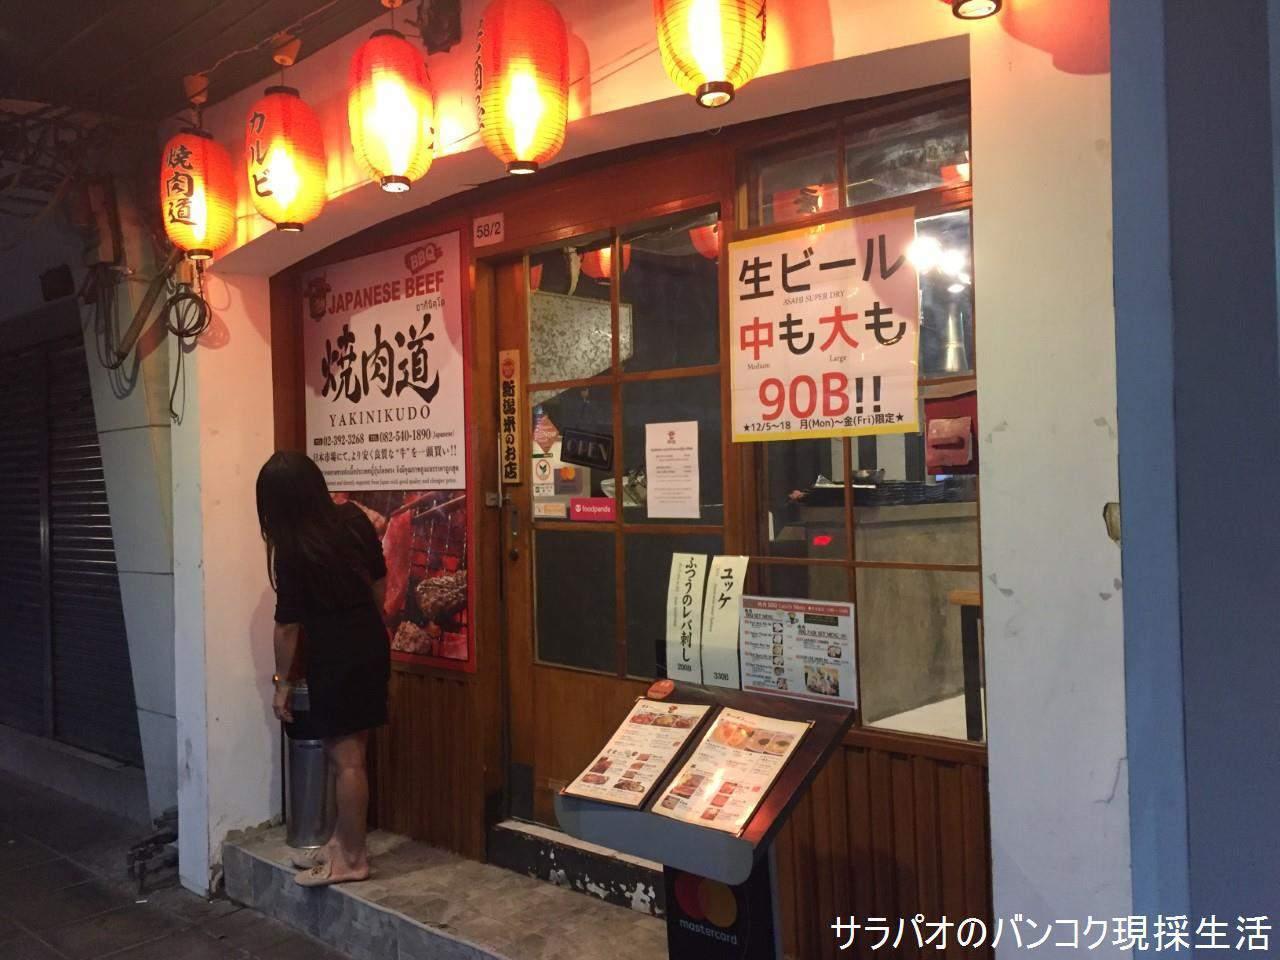 Yakinikudo_01.jpg